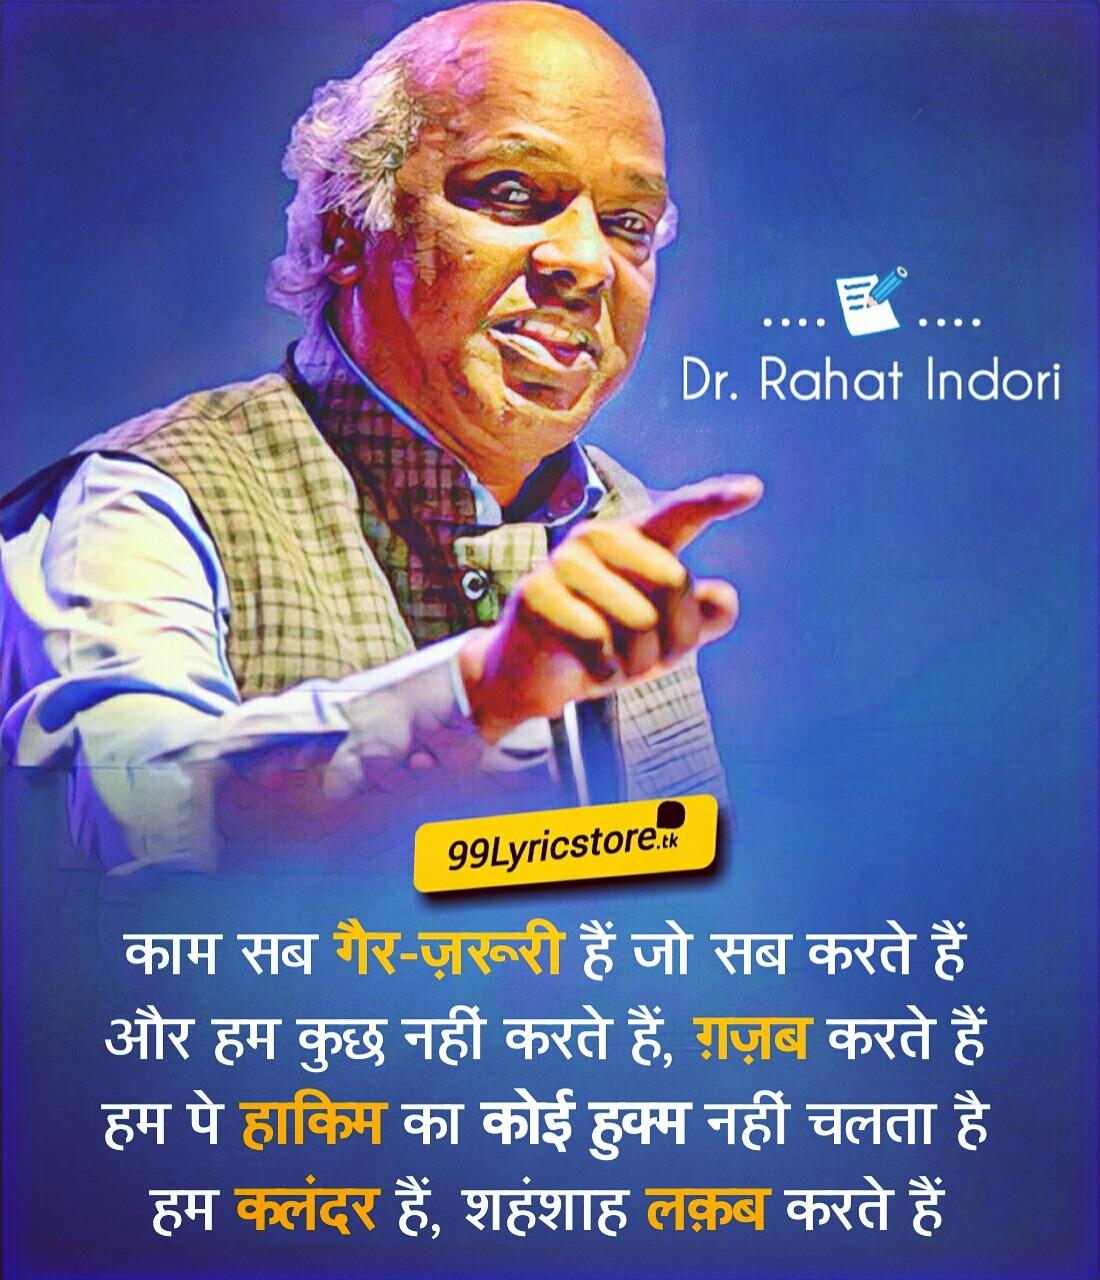 Kaam Sab Gair Zaroori Hain Jo Sab Karte Hain written and performed by Rahat Indori. This poetry is best Shayari and Ghazal of Rahat Indori.